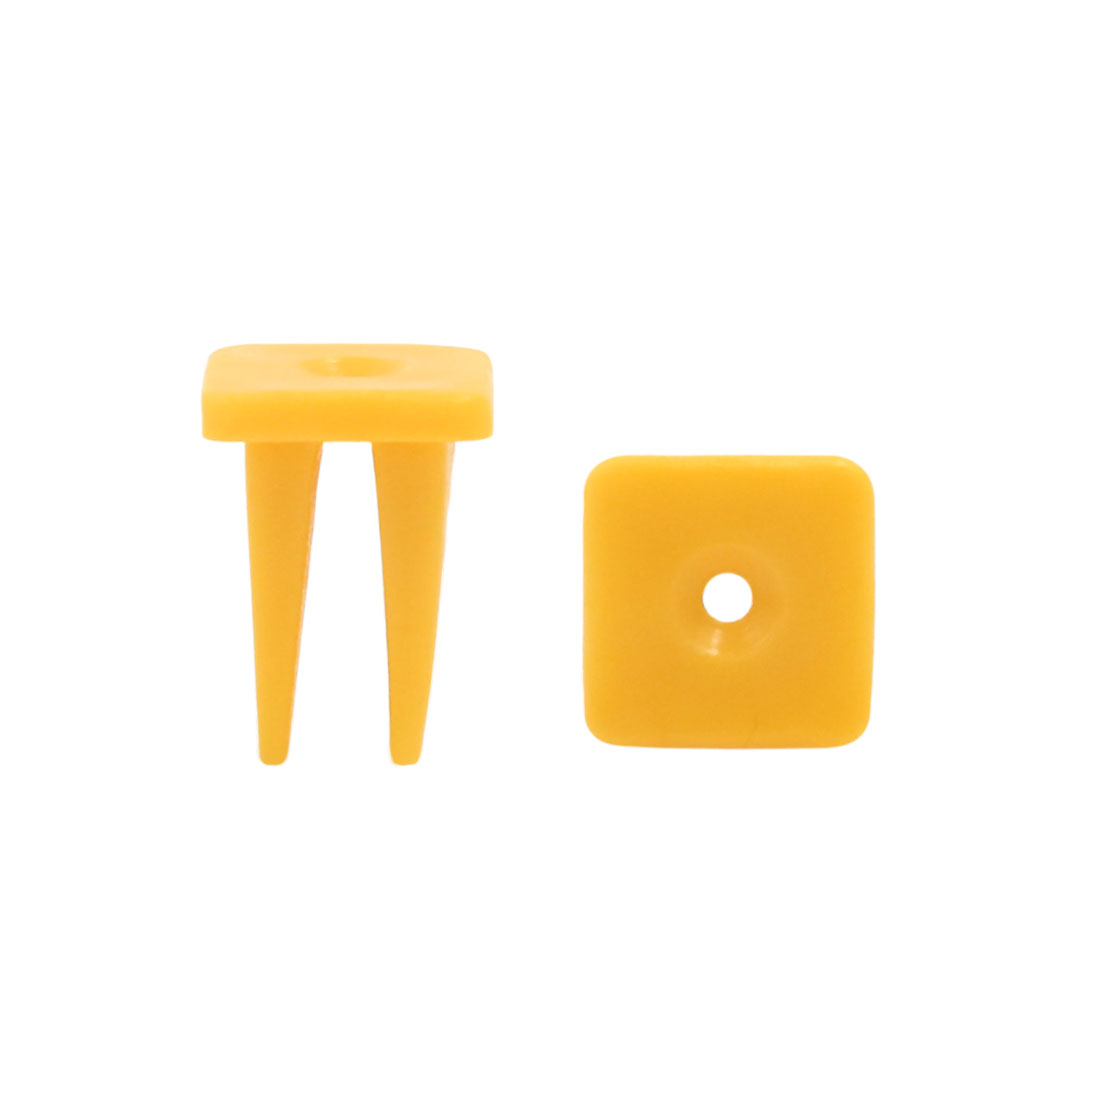 20Pcs Yellow Plastic Rivet Door Trim Panel Hood Moulding Clips 8 x 8mm for Car